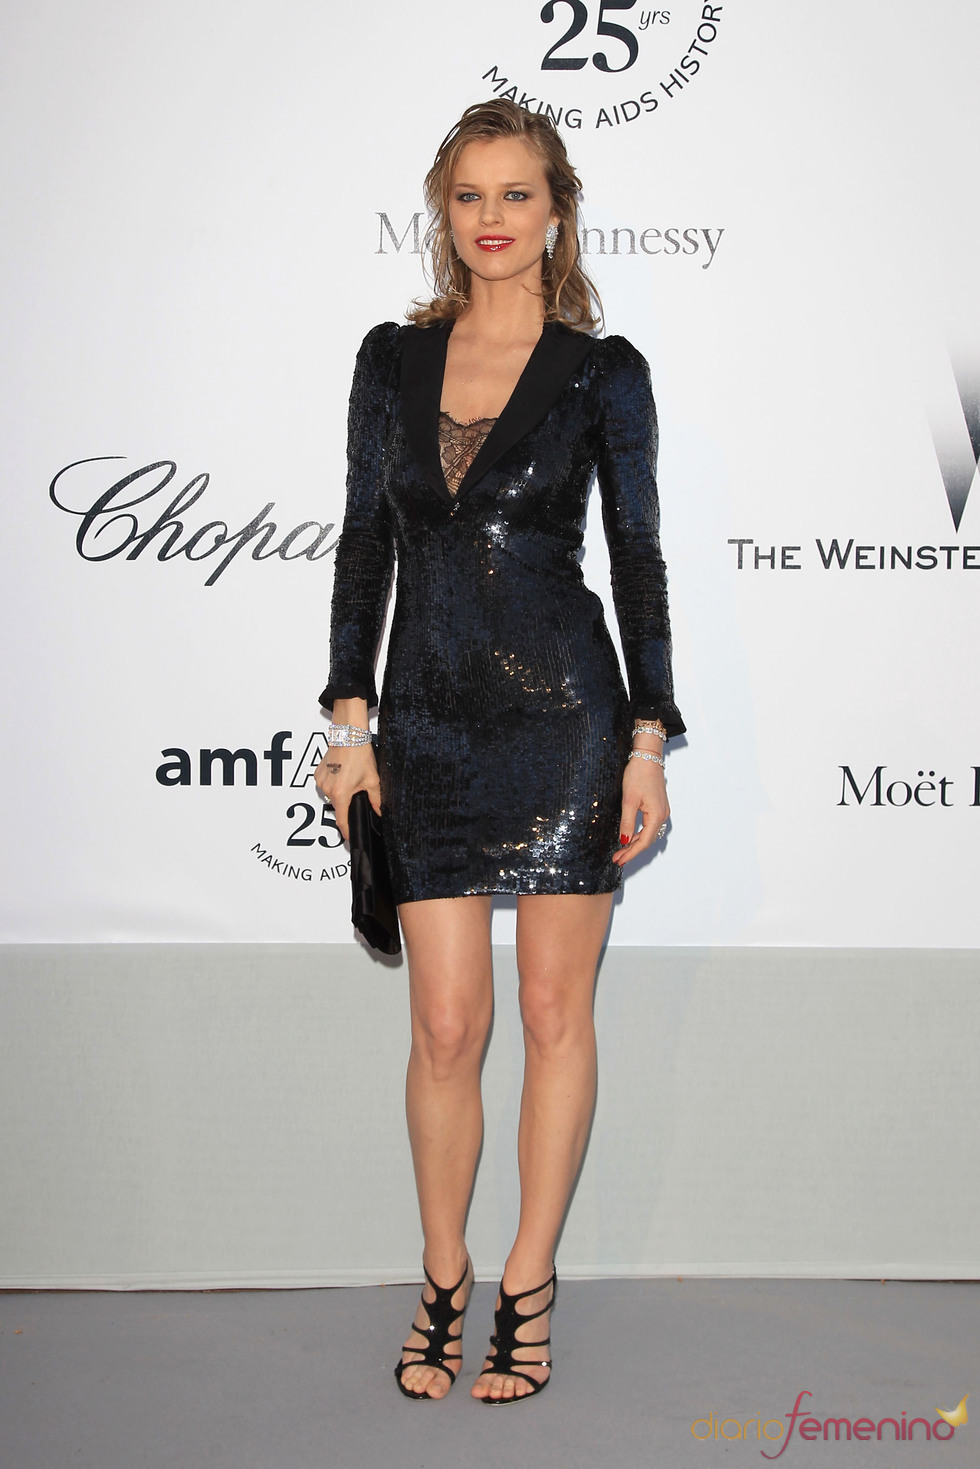 Eva Herzigova en la gala benéfica contra el sida de Cannes 2011